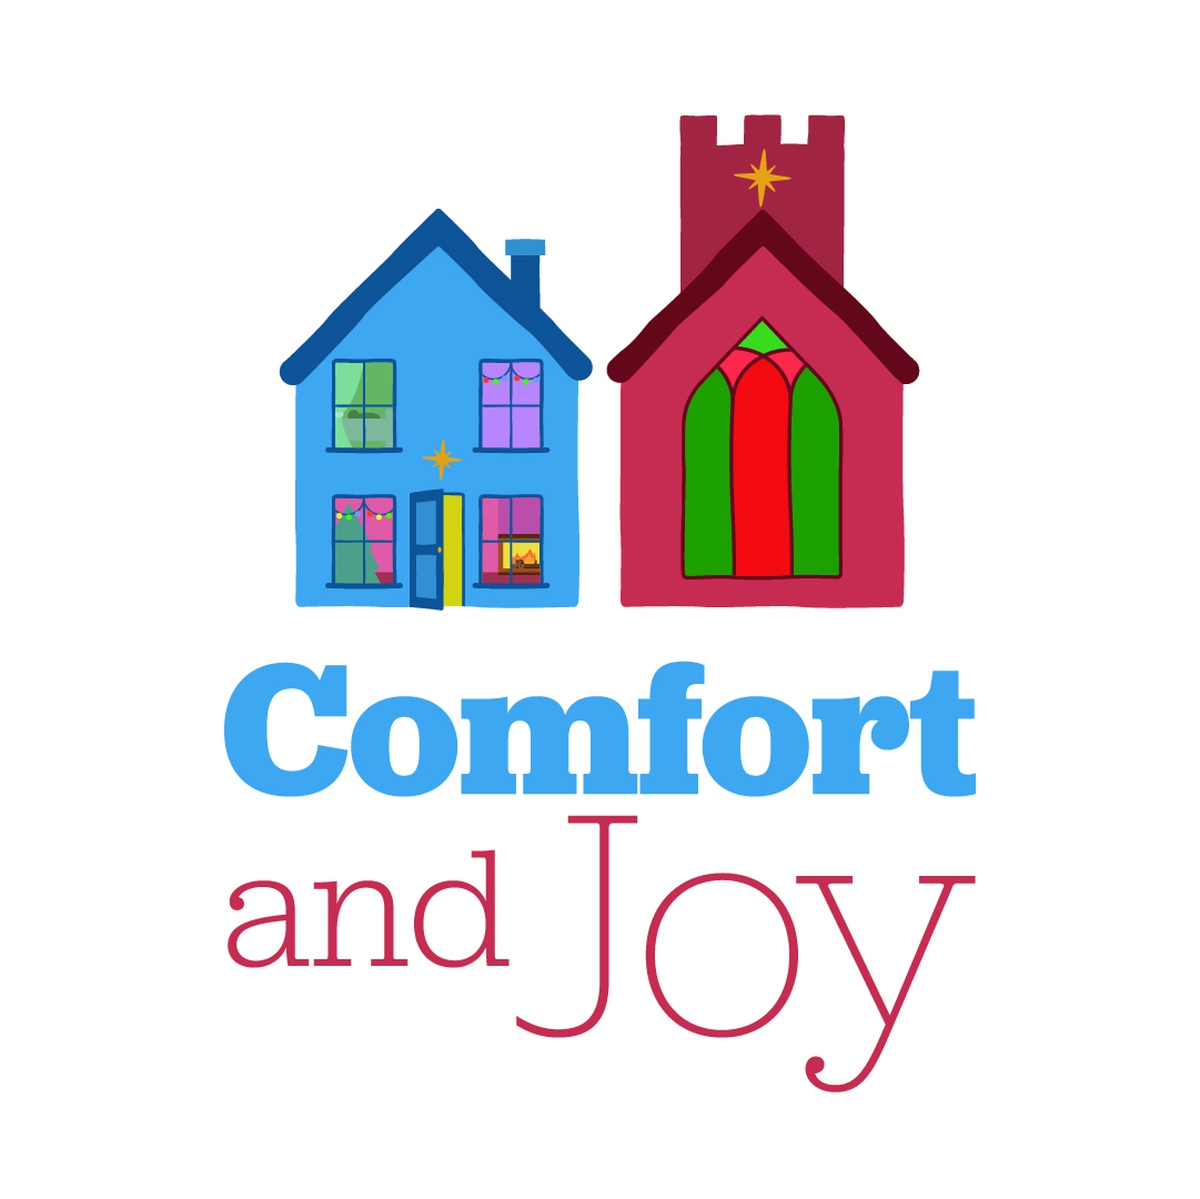 Comfort and Joy logo